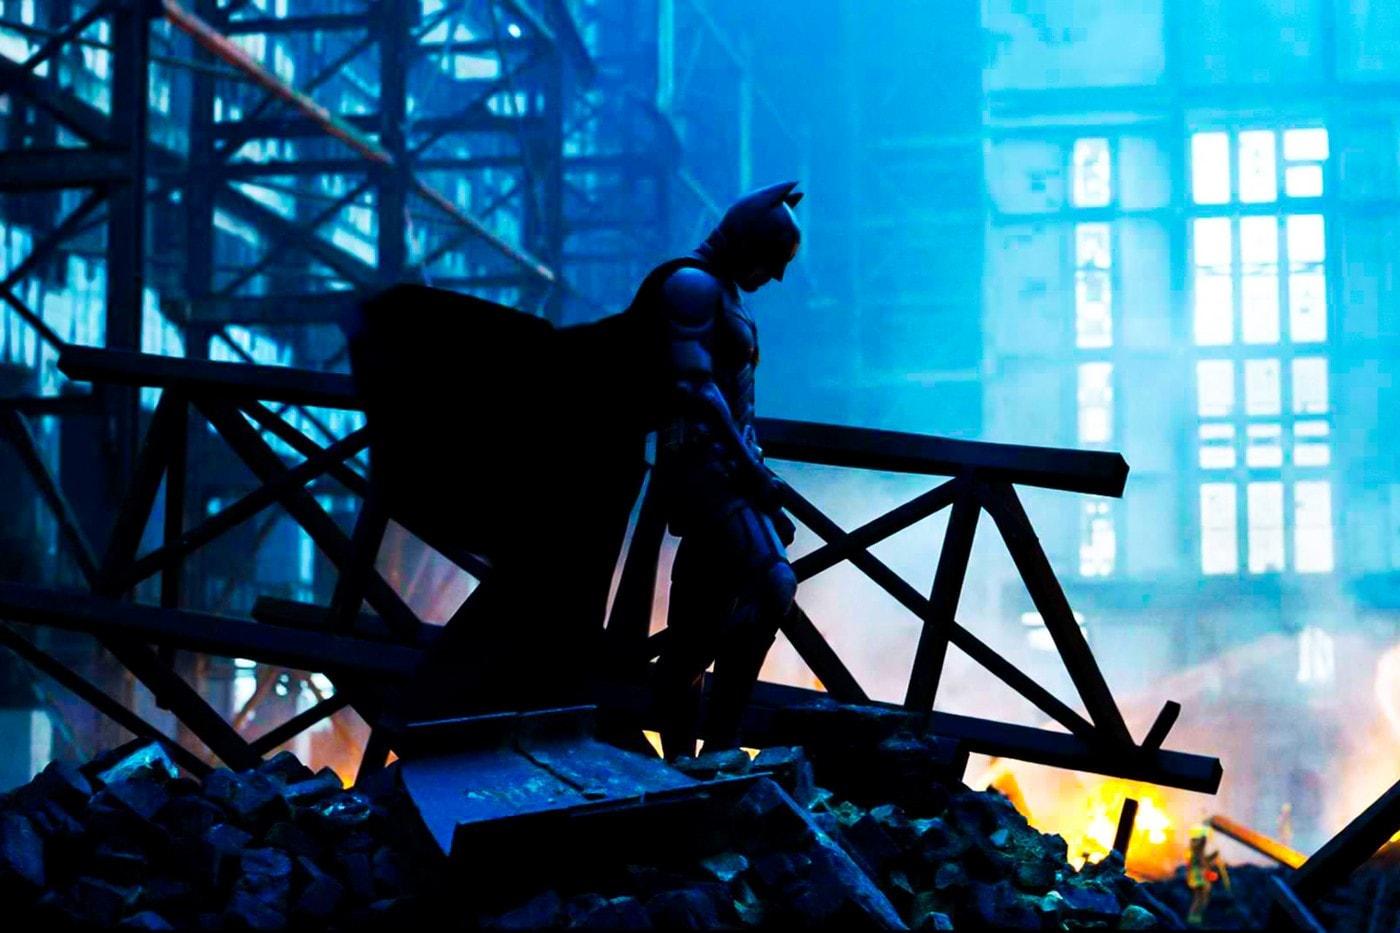 The Batman Robert Pattinson Matt Reeves DC FanDome Trailer Warner Bros. Pictures Christopher Nolan The Dark Knight Rises